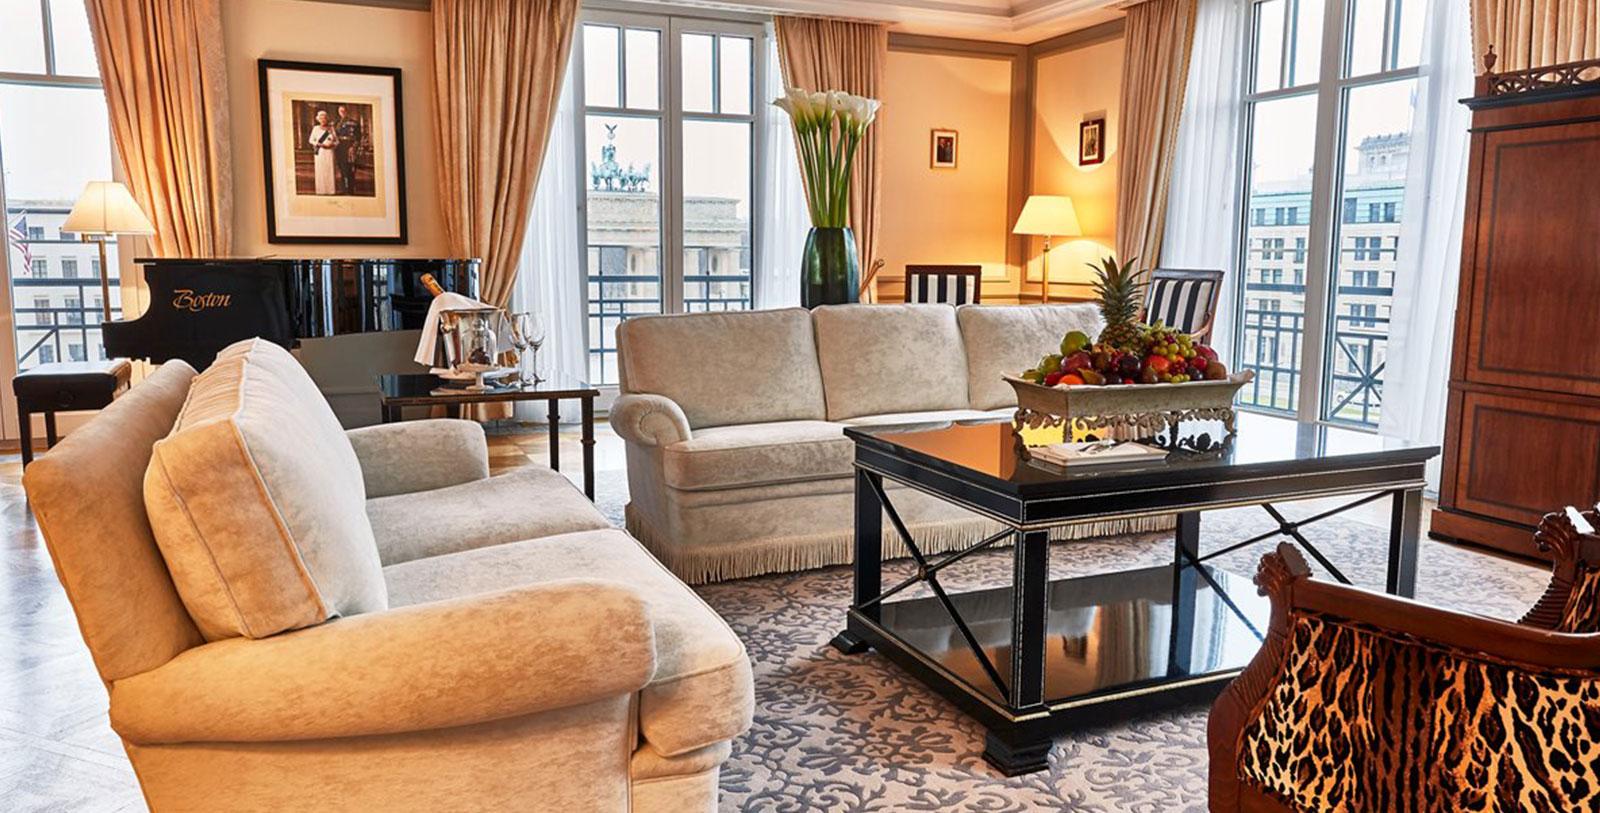 Image of Royal Suite Living Room Interior, Hotel Adlon Kempinski, Berlin, Germany, 1907, Member of Historic Hotels Worldwide, Accommodations